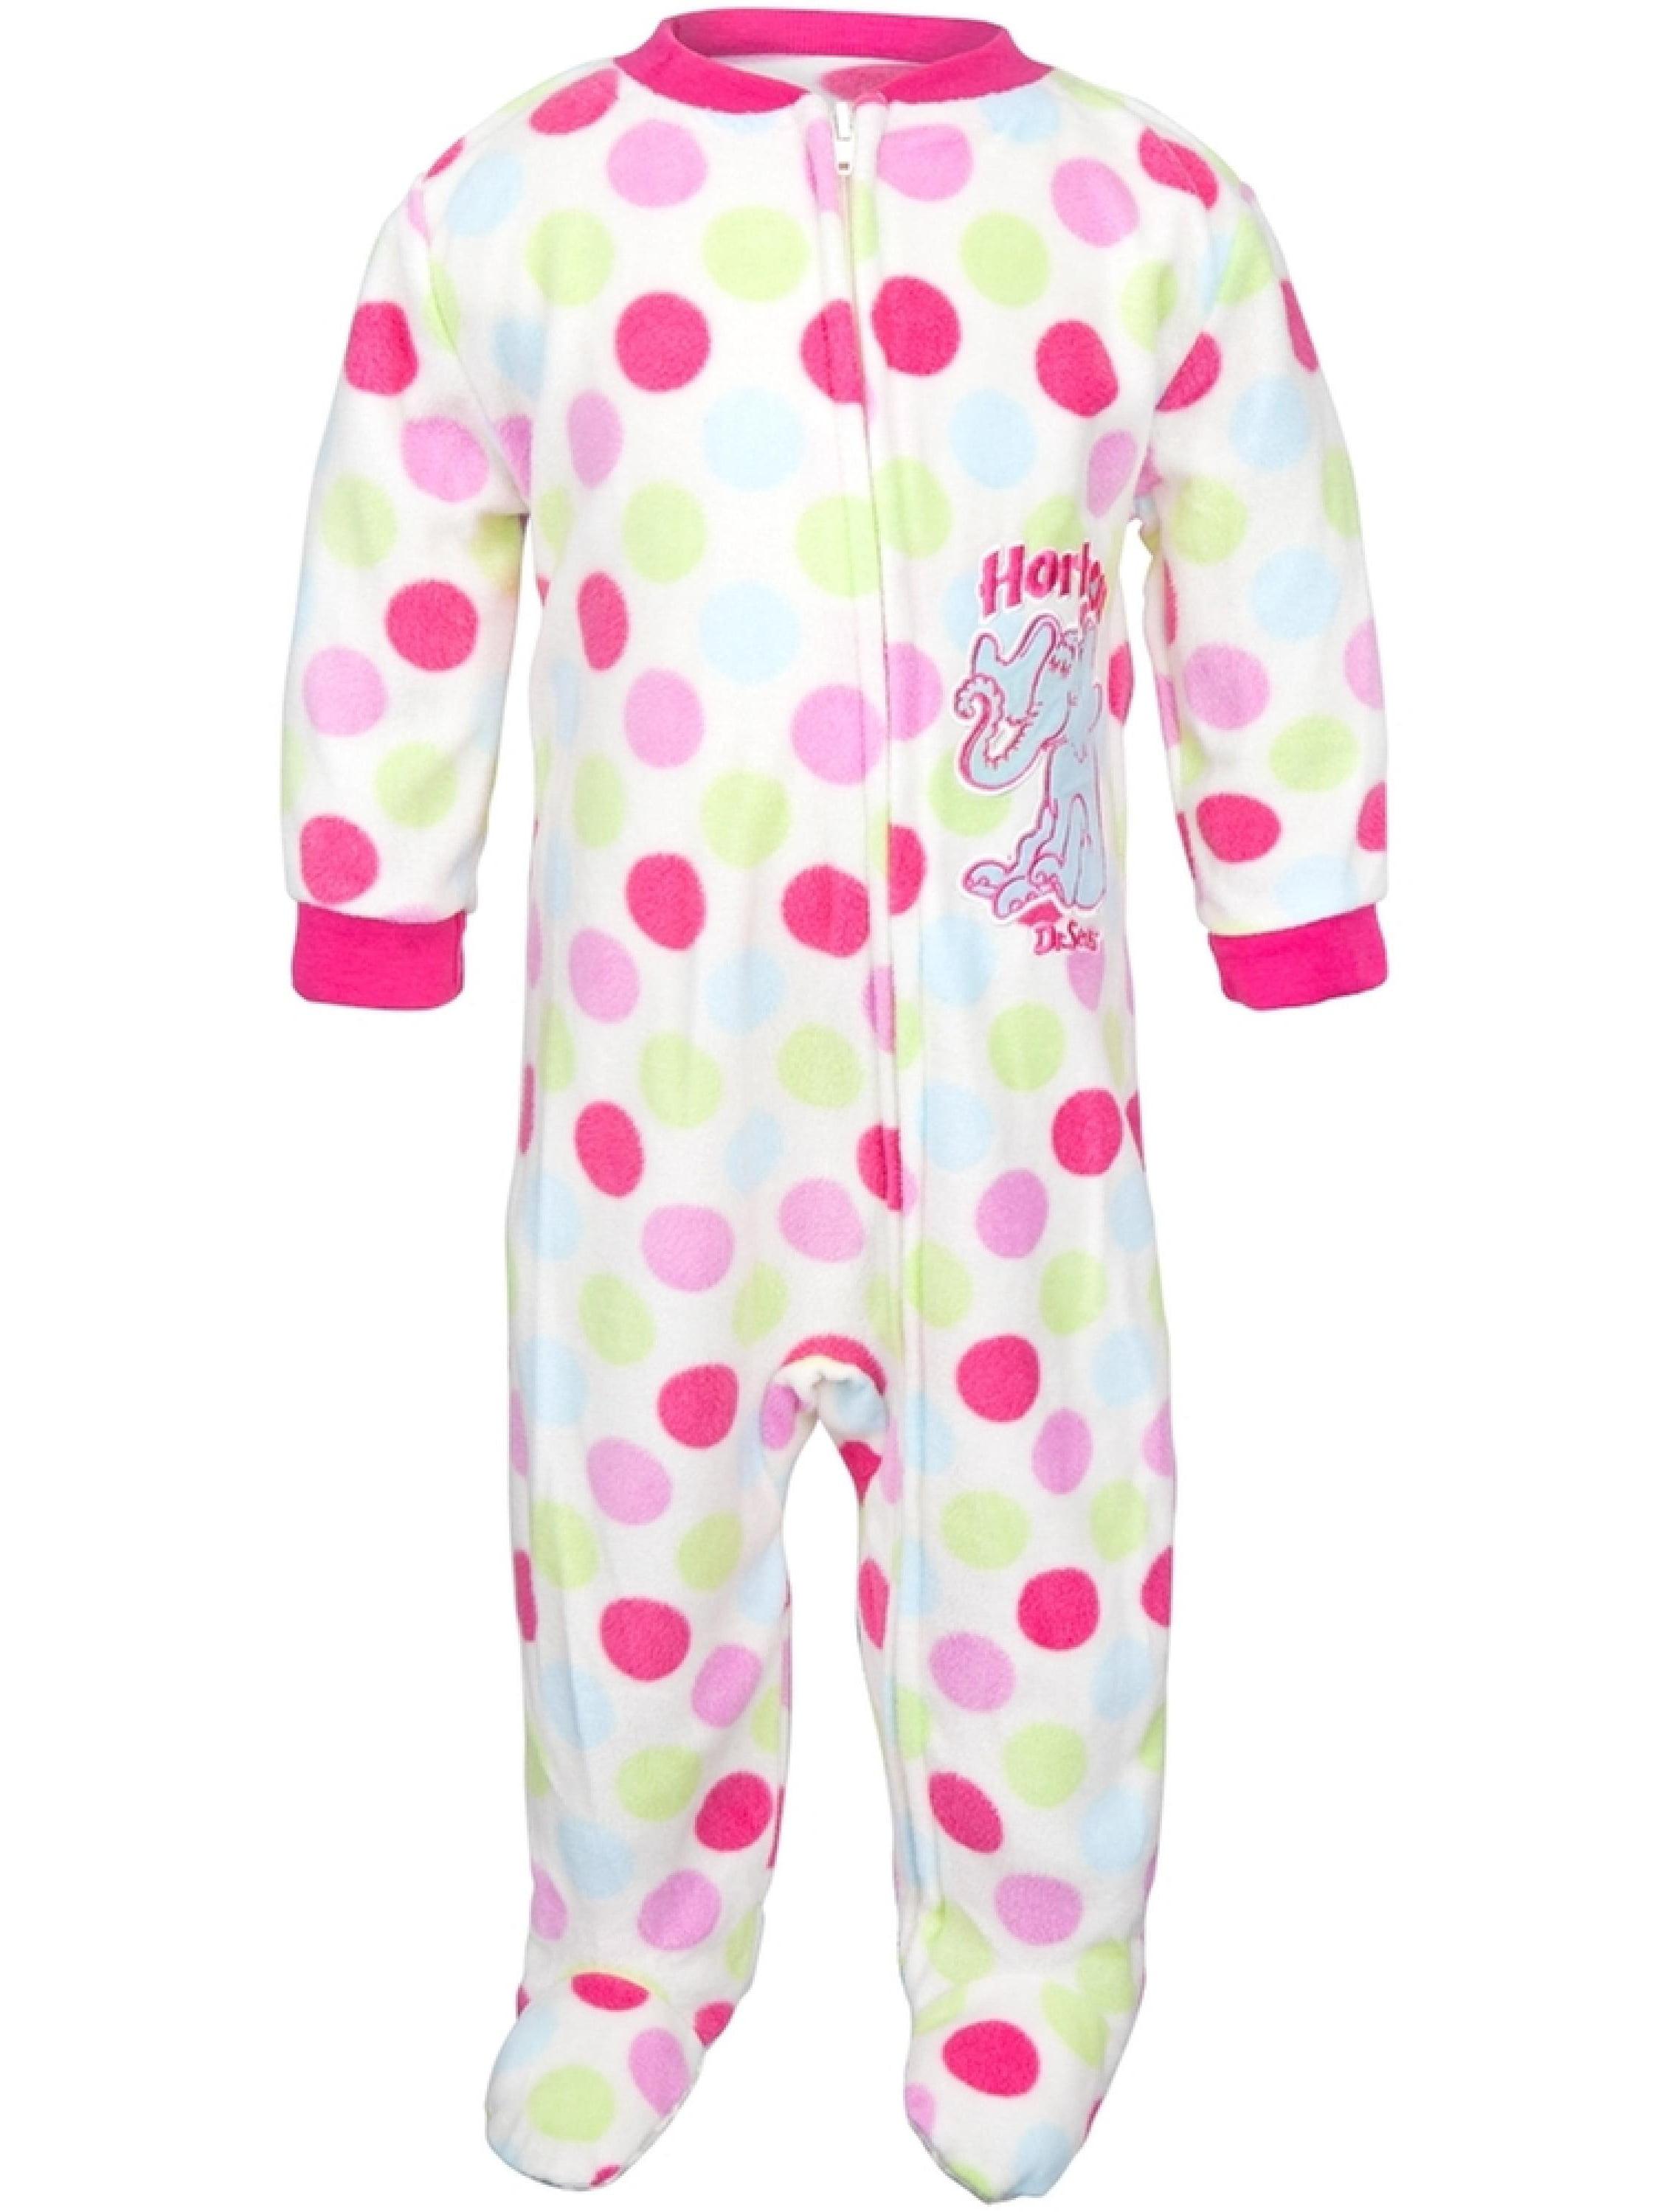 Dr. Seuss - Horton Polka-Dot Infant Footed Pajamas